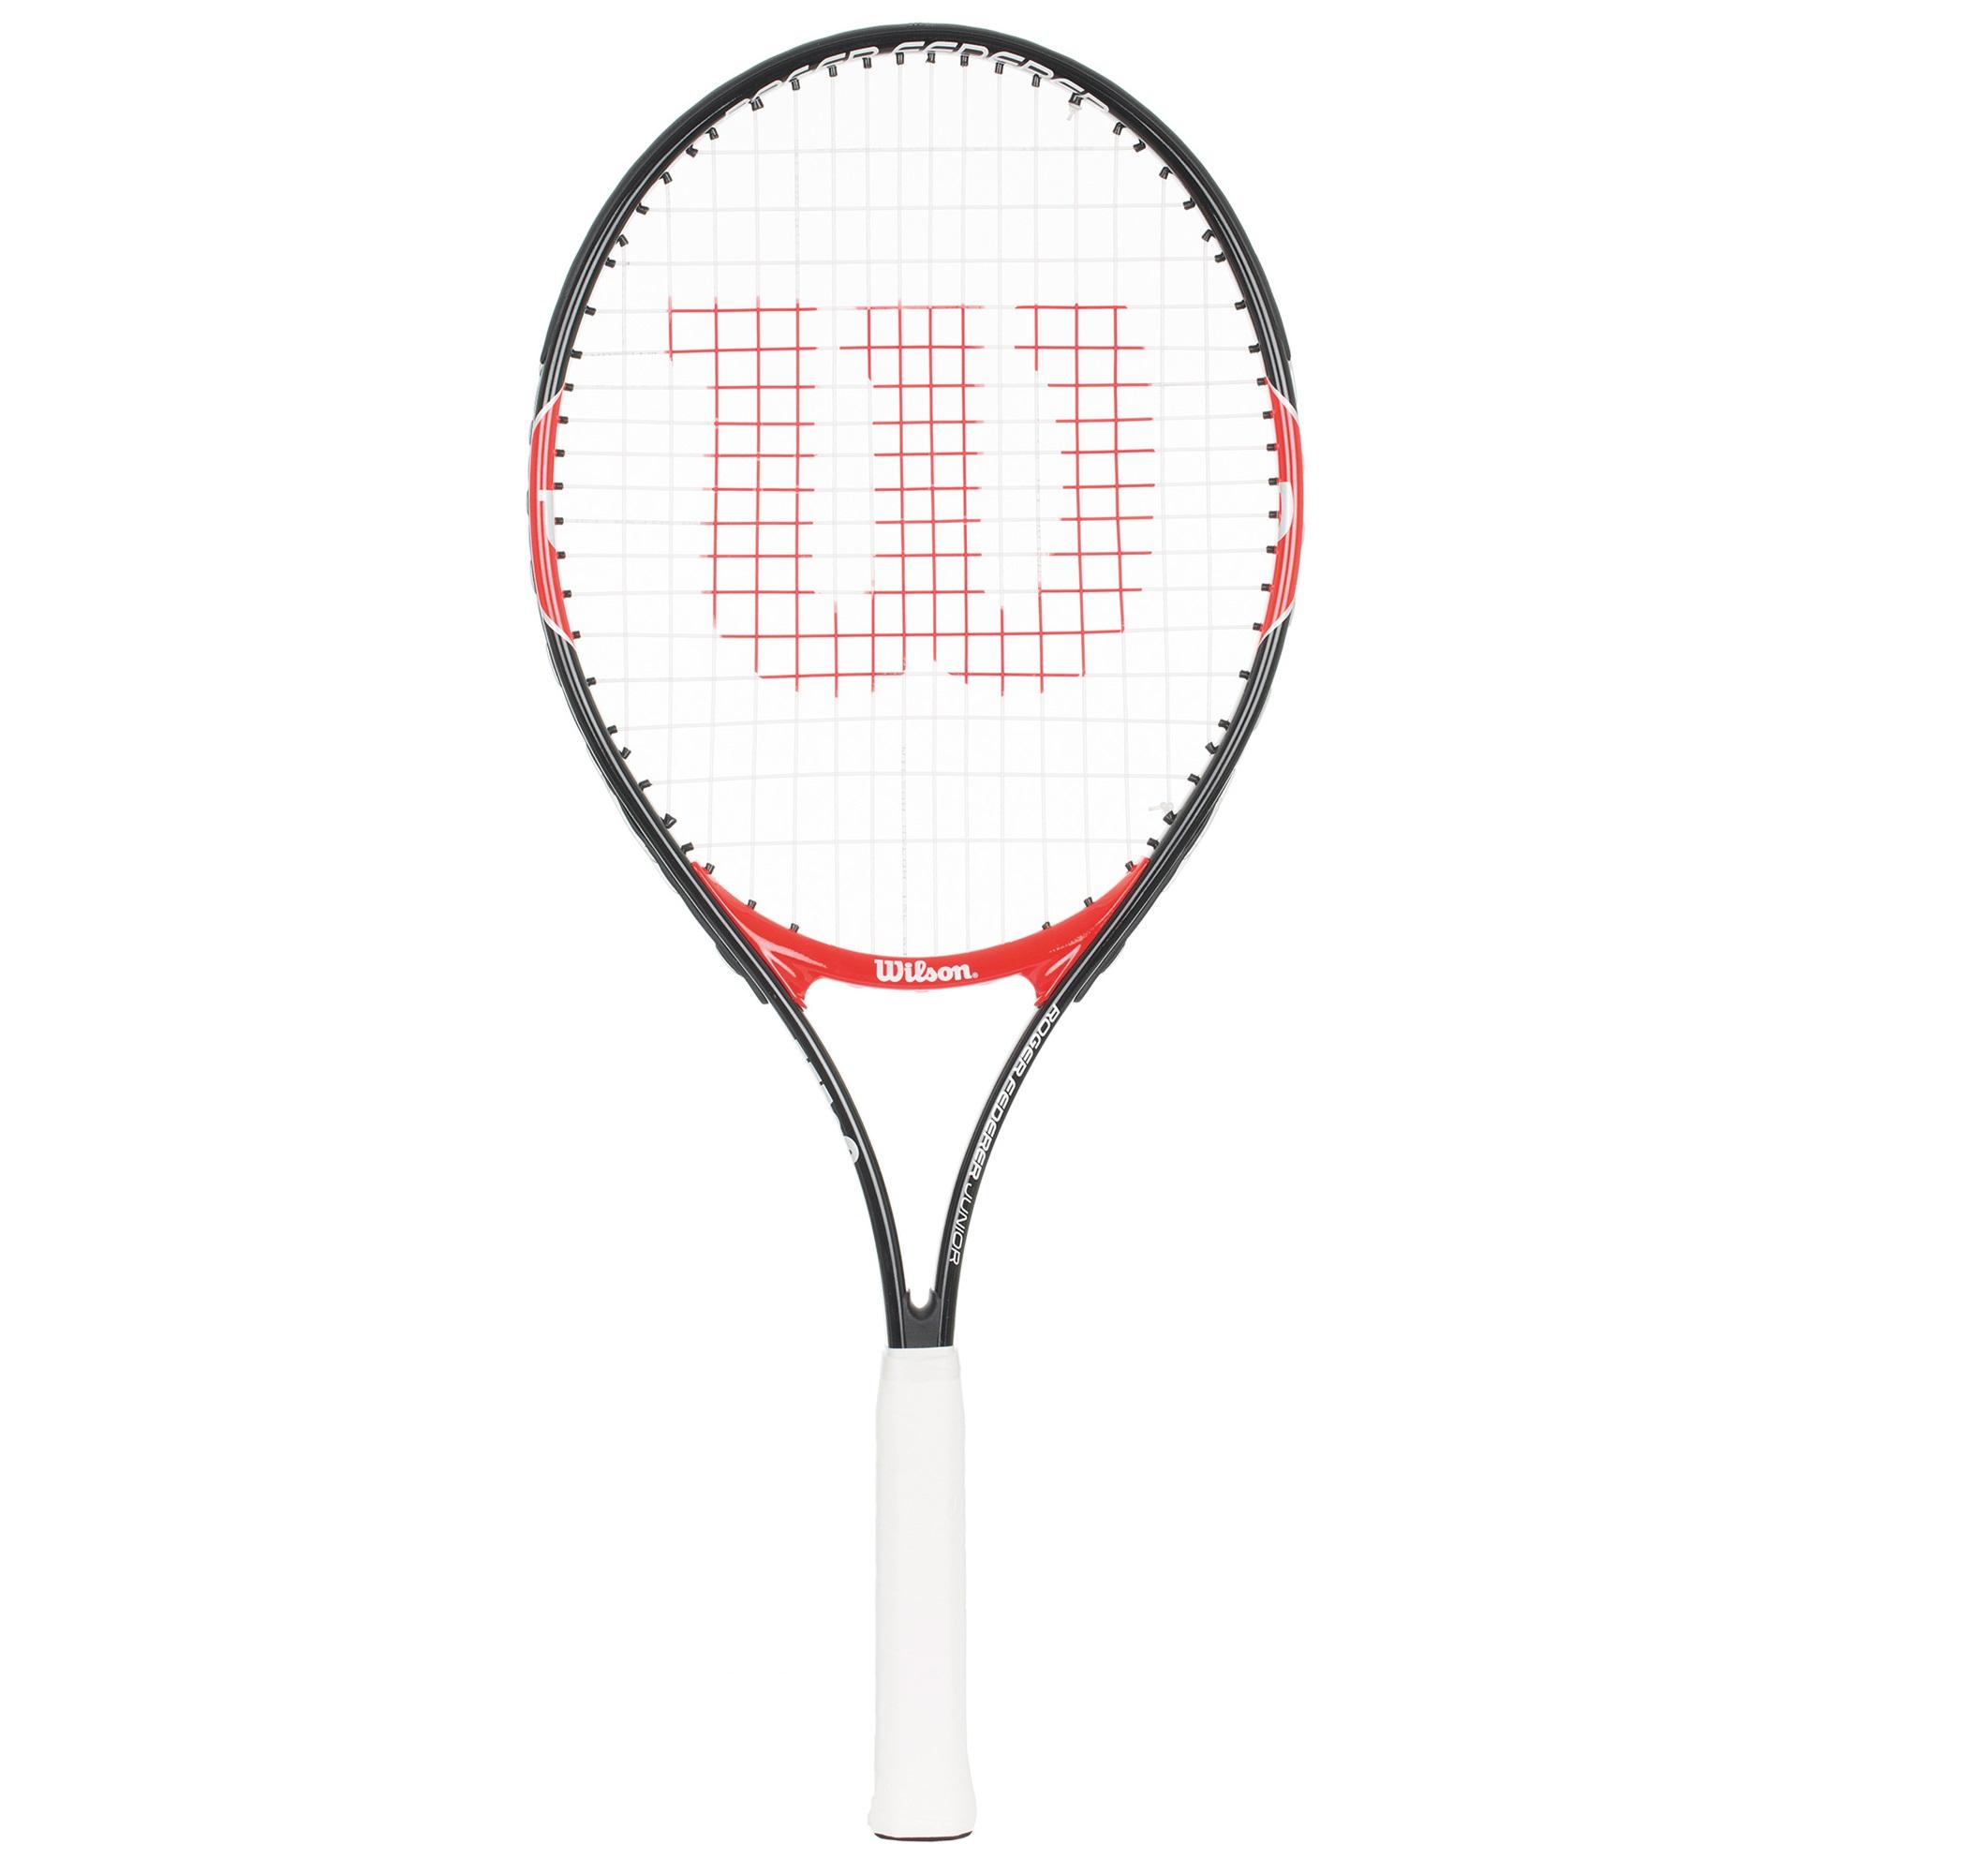 Wilson Ракетка для большого тенниса детская Wilson Roger Federer 25, размер Без размера wilson набор мячей для большого тенниса wilson us open x3 размер без размера